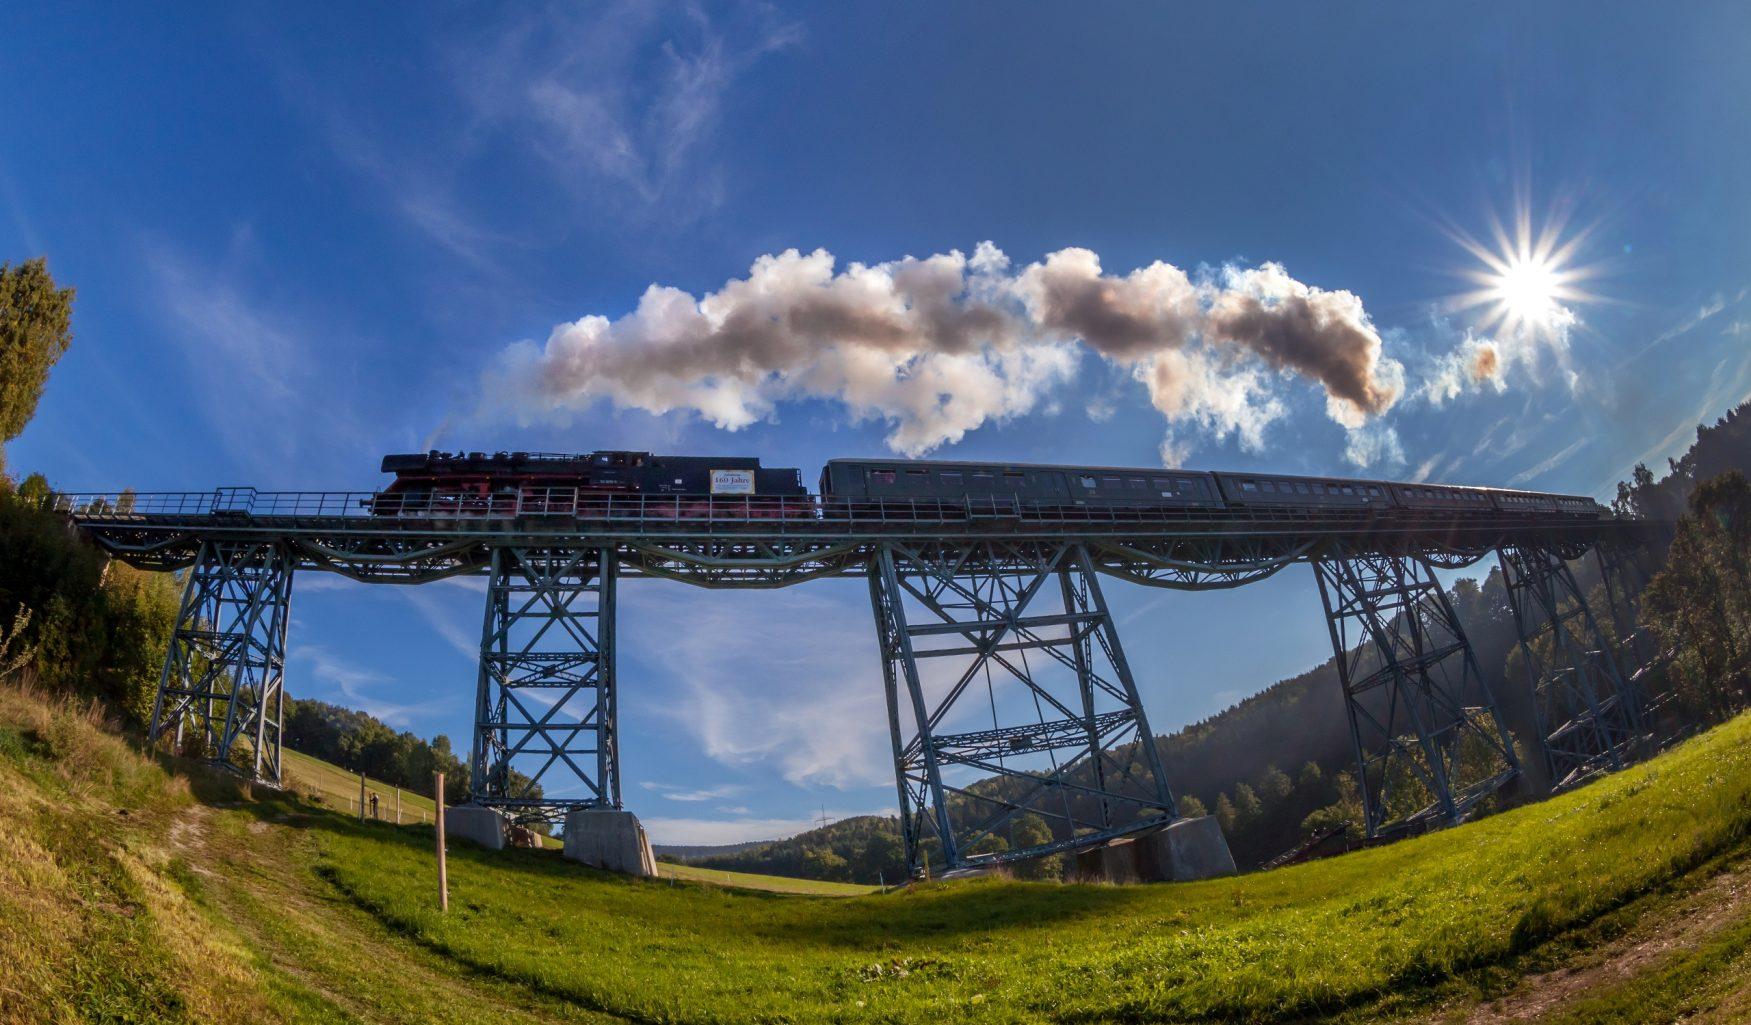 Fotograf / Quelle Tourismusverband Aussichtsbahn Viadukt e.V./Uwe Meinhold